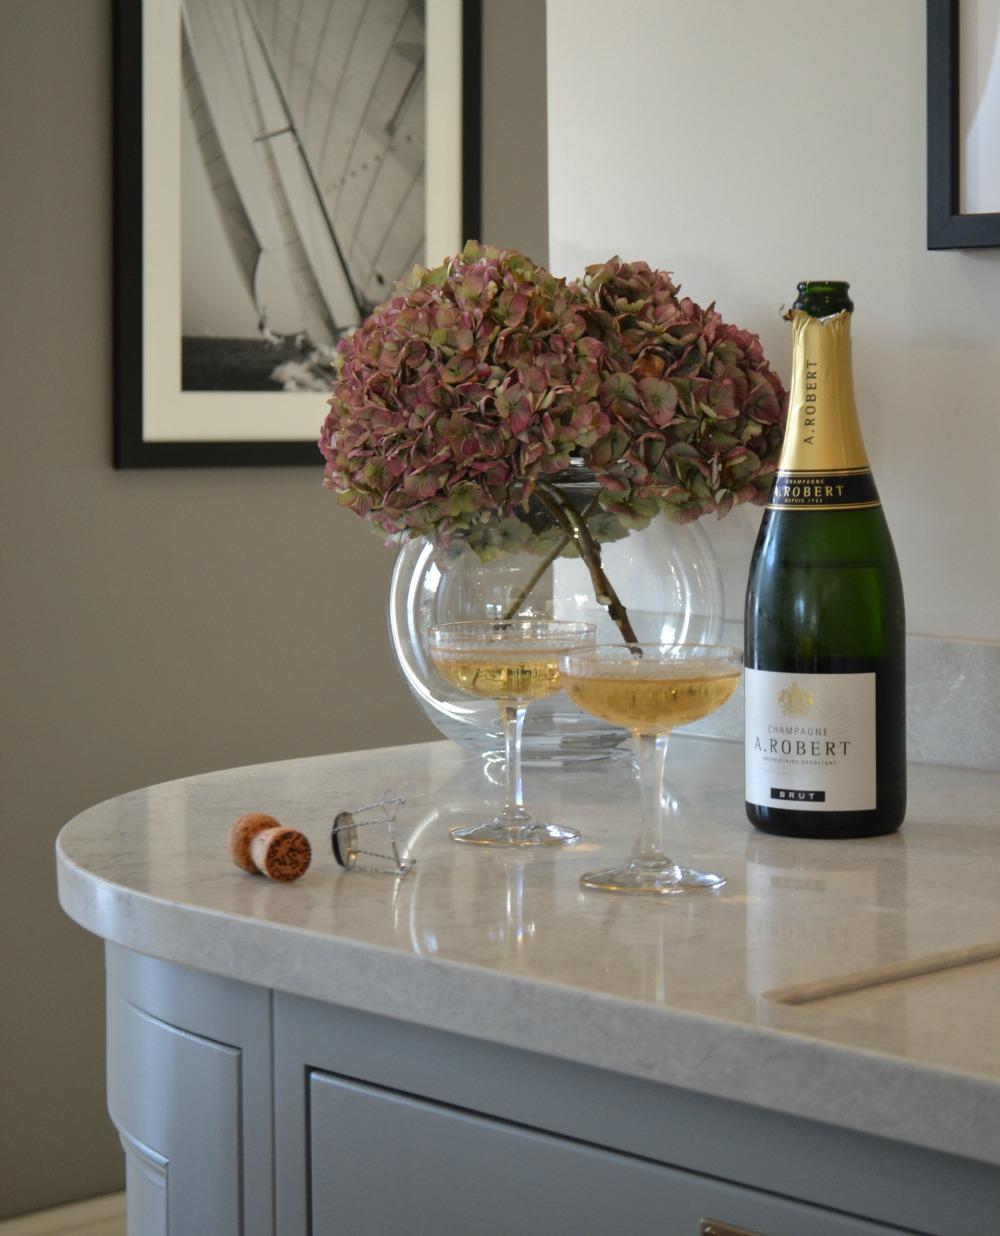 Champagne A. Robert - Perfect Festive Fizz - Humphrey Munson Blog 2